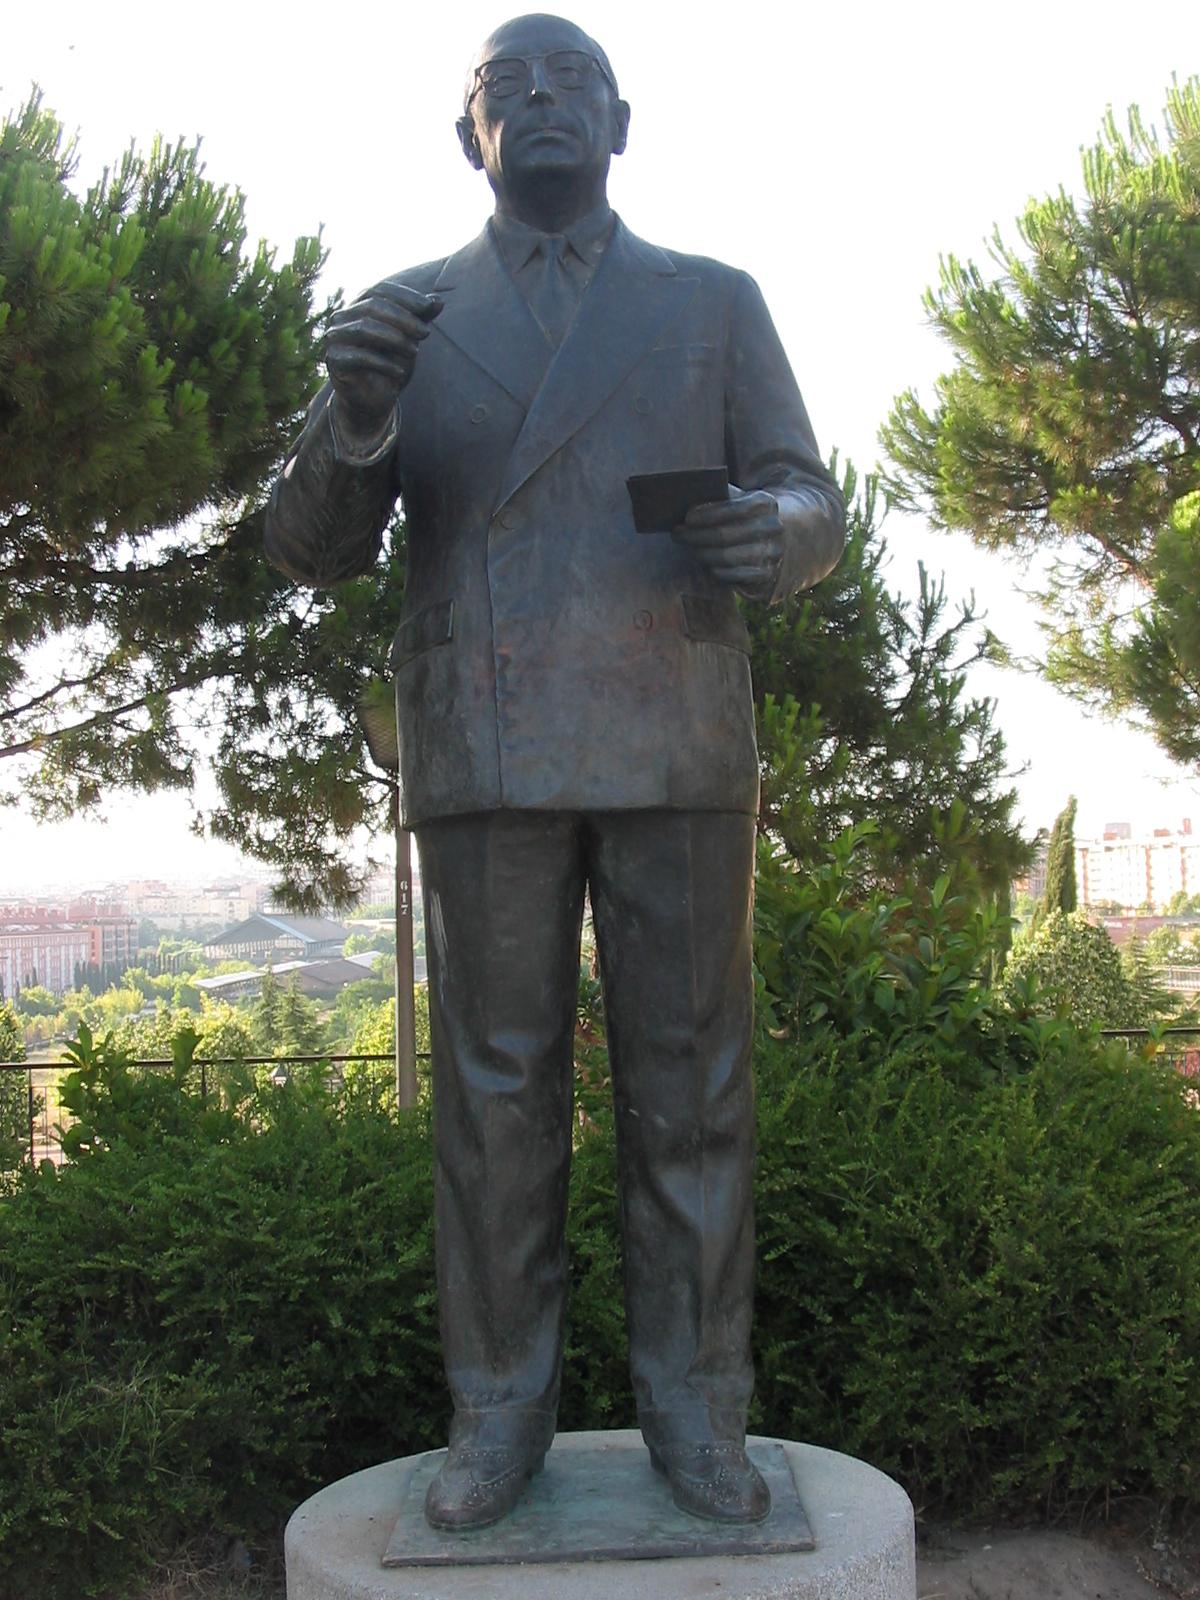 Statue of Tierno Galván in [[Madrid